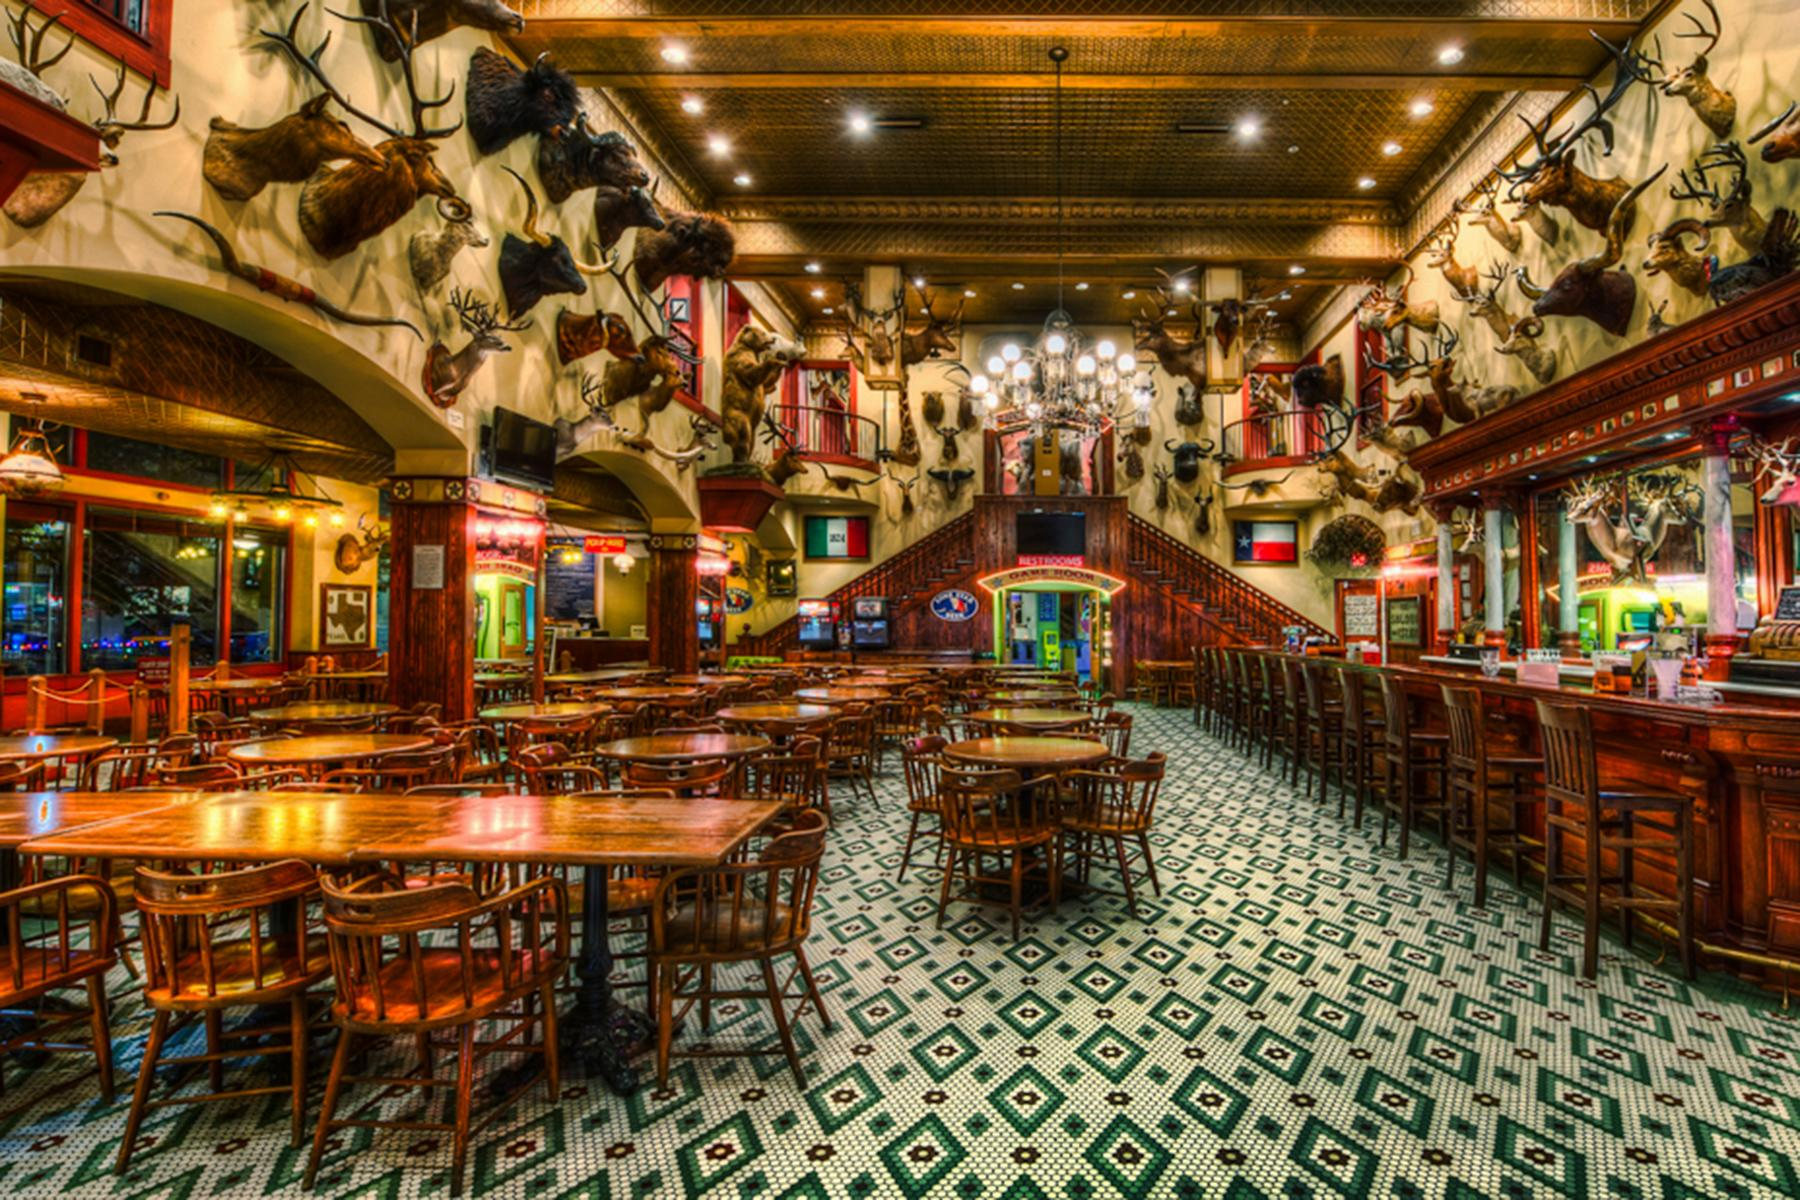 8 Best Things To Do In San Antonio